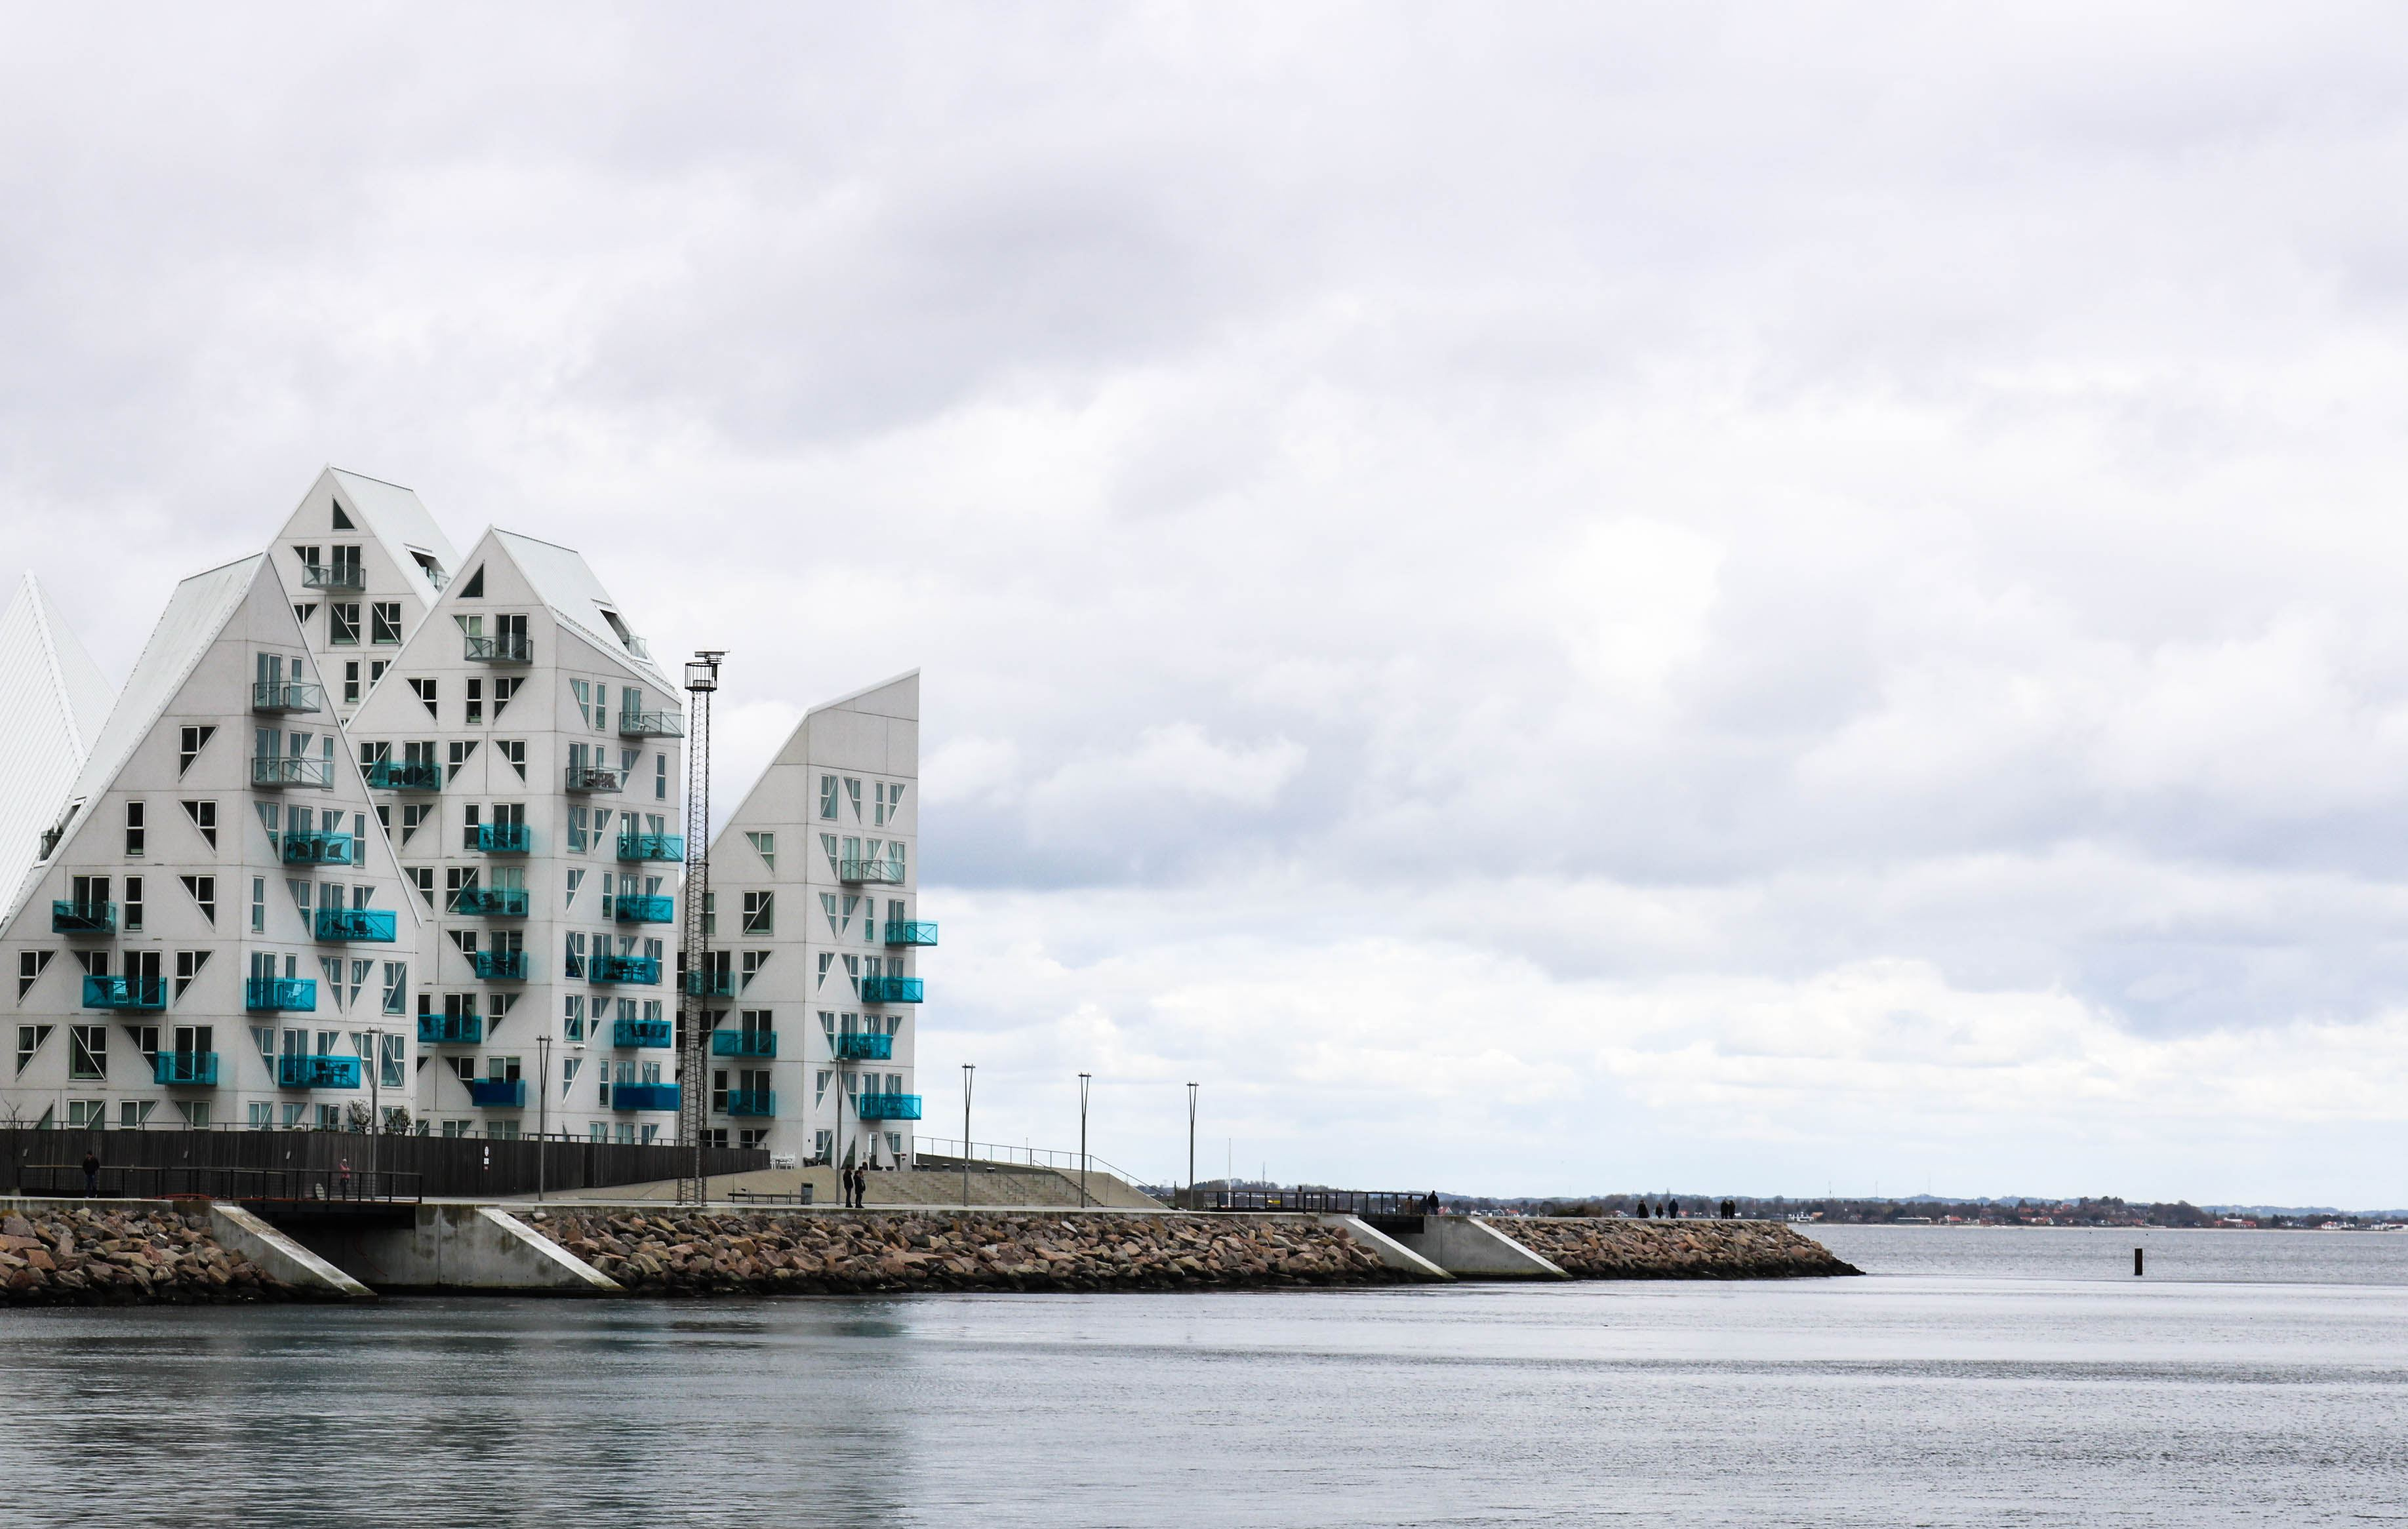 Iceberg 4 1920x1219 - Why You Should Visit Aarhus Before 2018